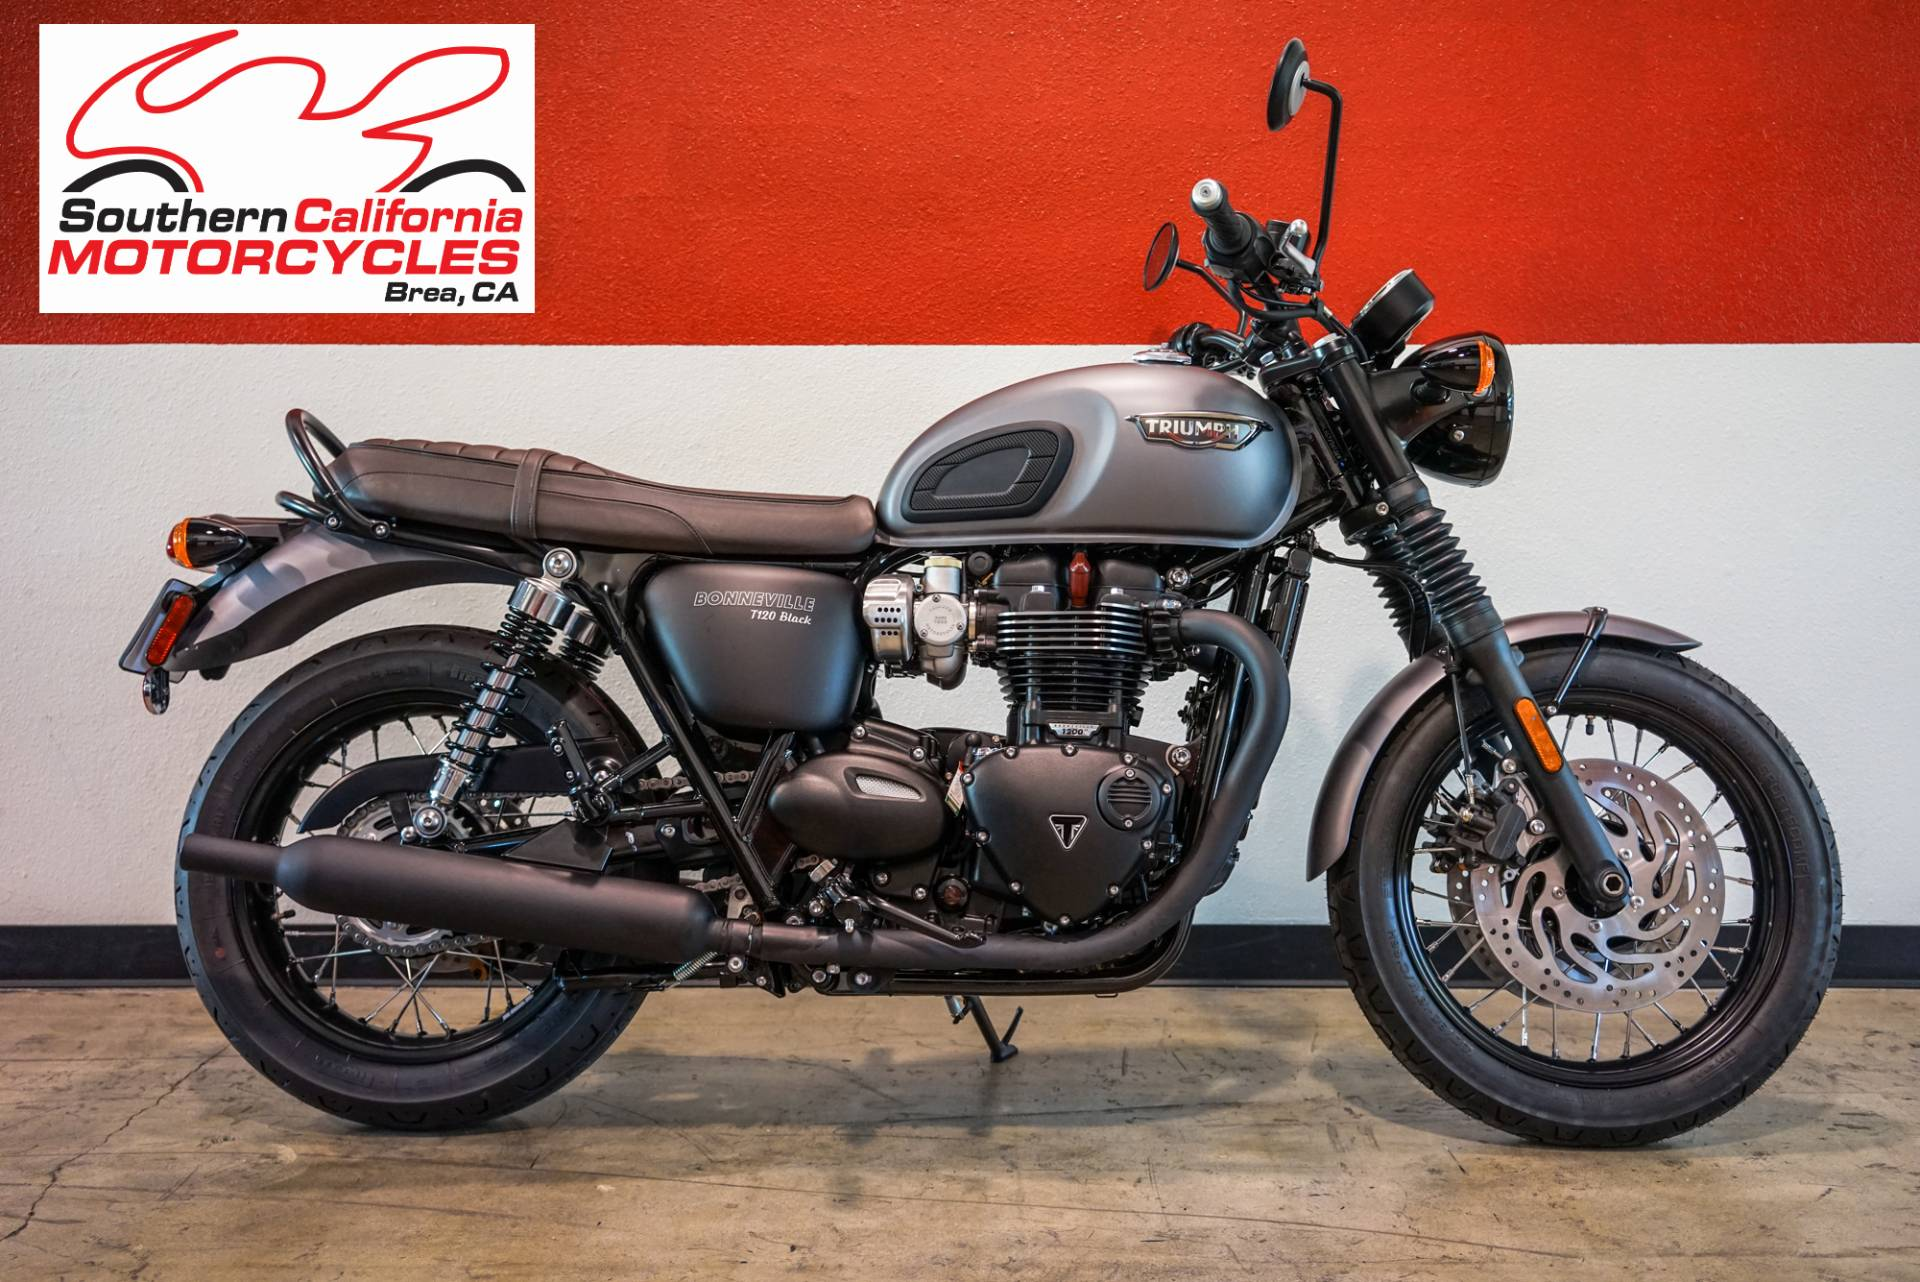 New 2018 Triumph Bonneville T120 Black Motorcycles In Brea Ca